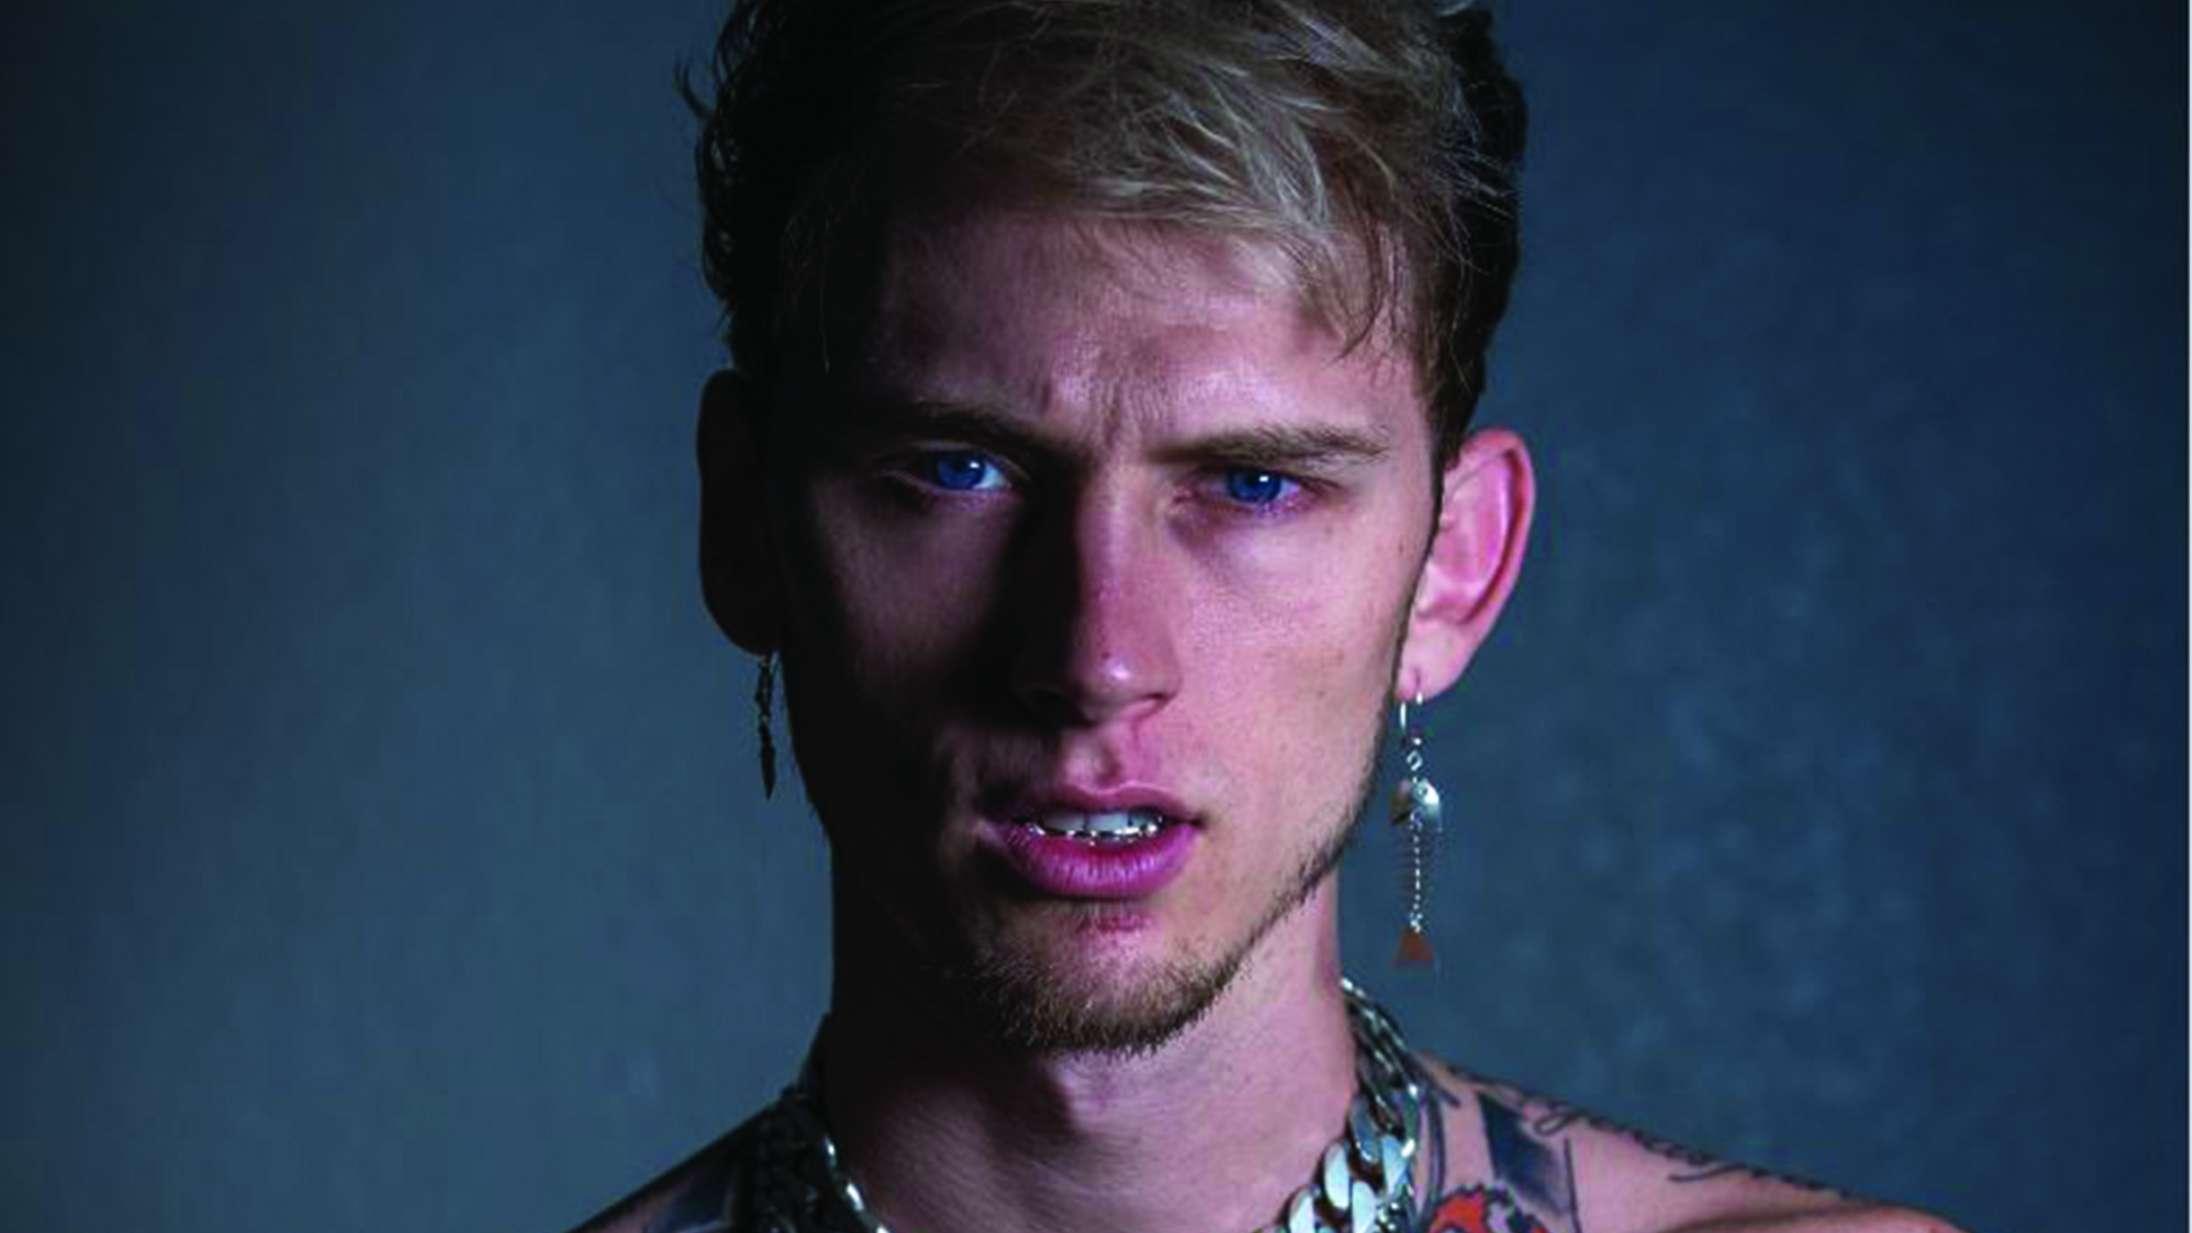 Machine Gun Kelly-film skifter titel efter hård kritik fra Mac Millers bror